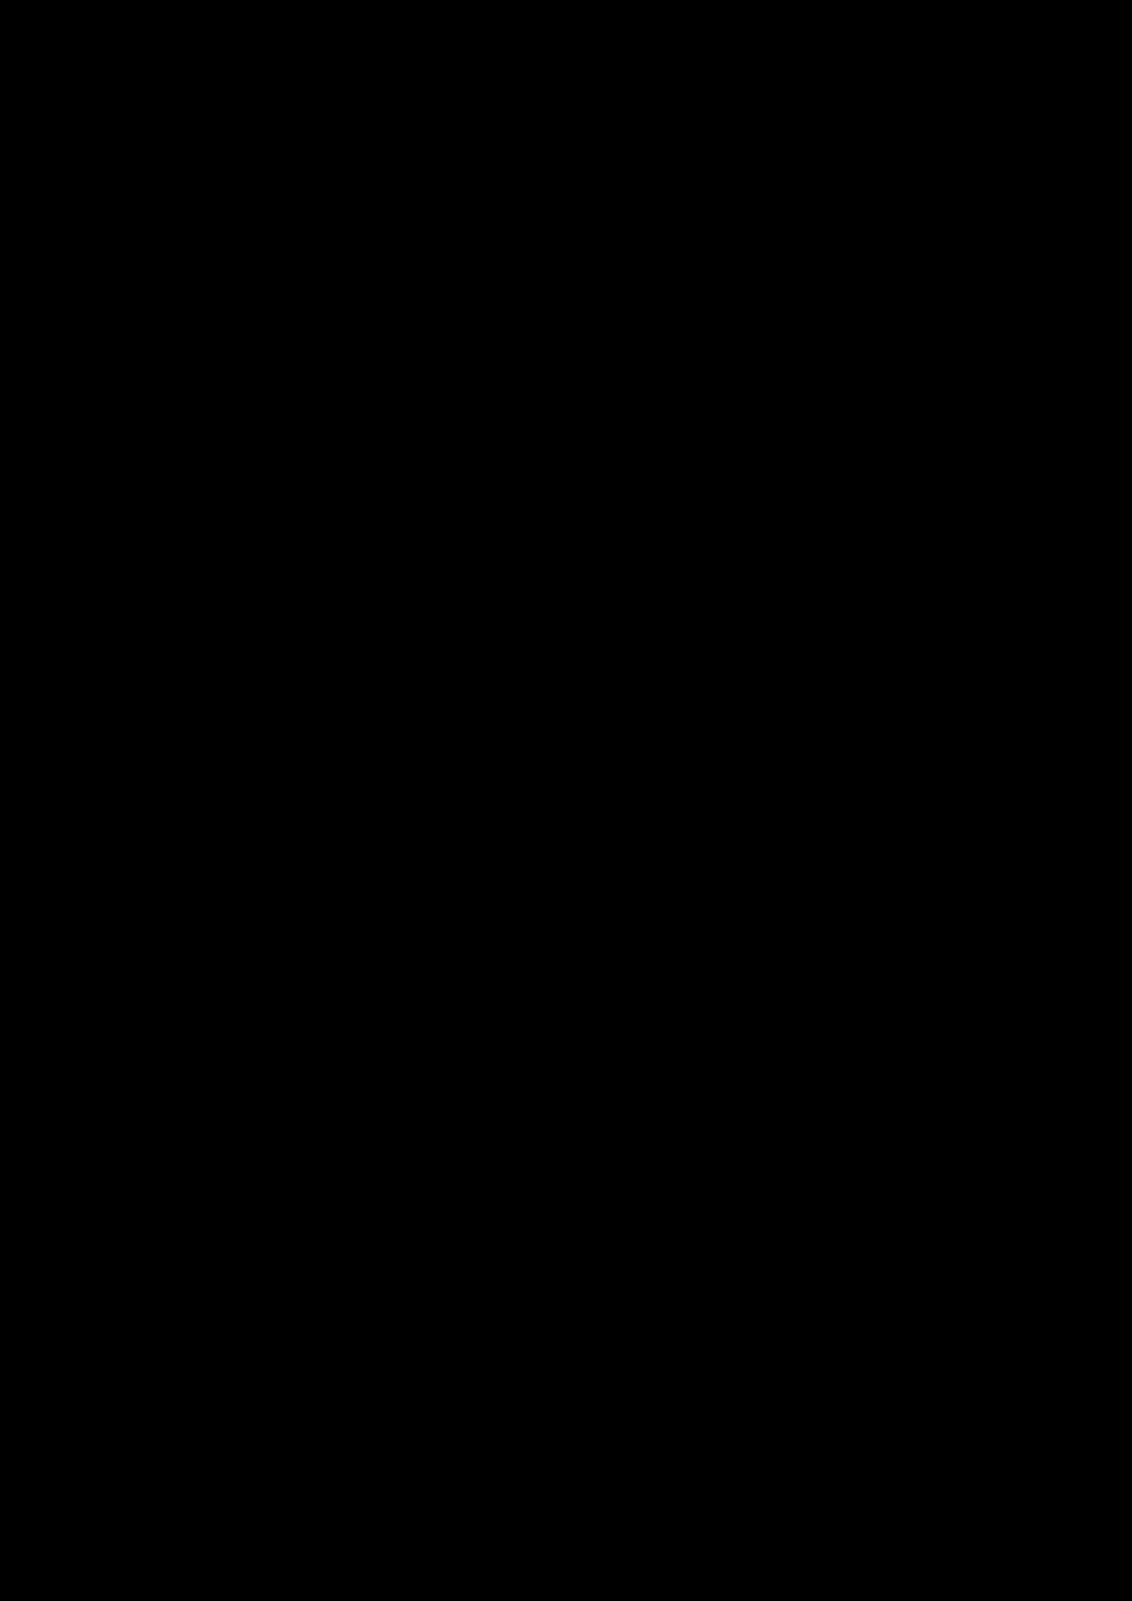 Belyiy sokol slide, Image 177